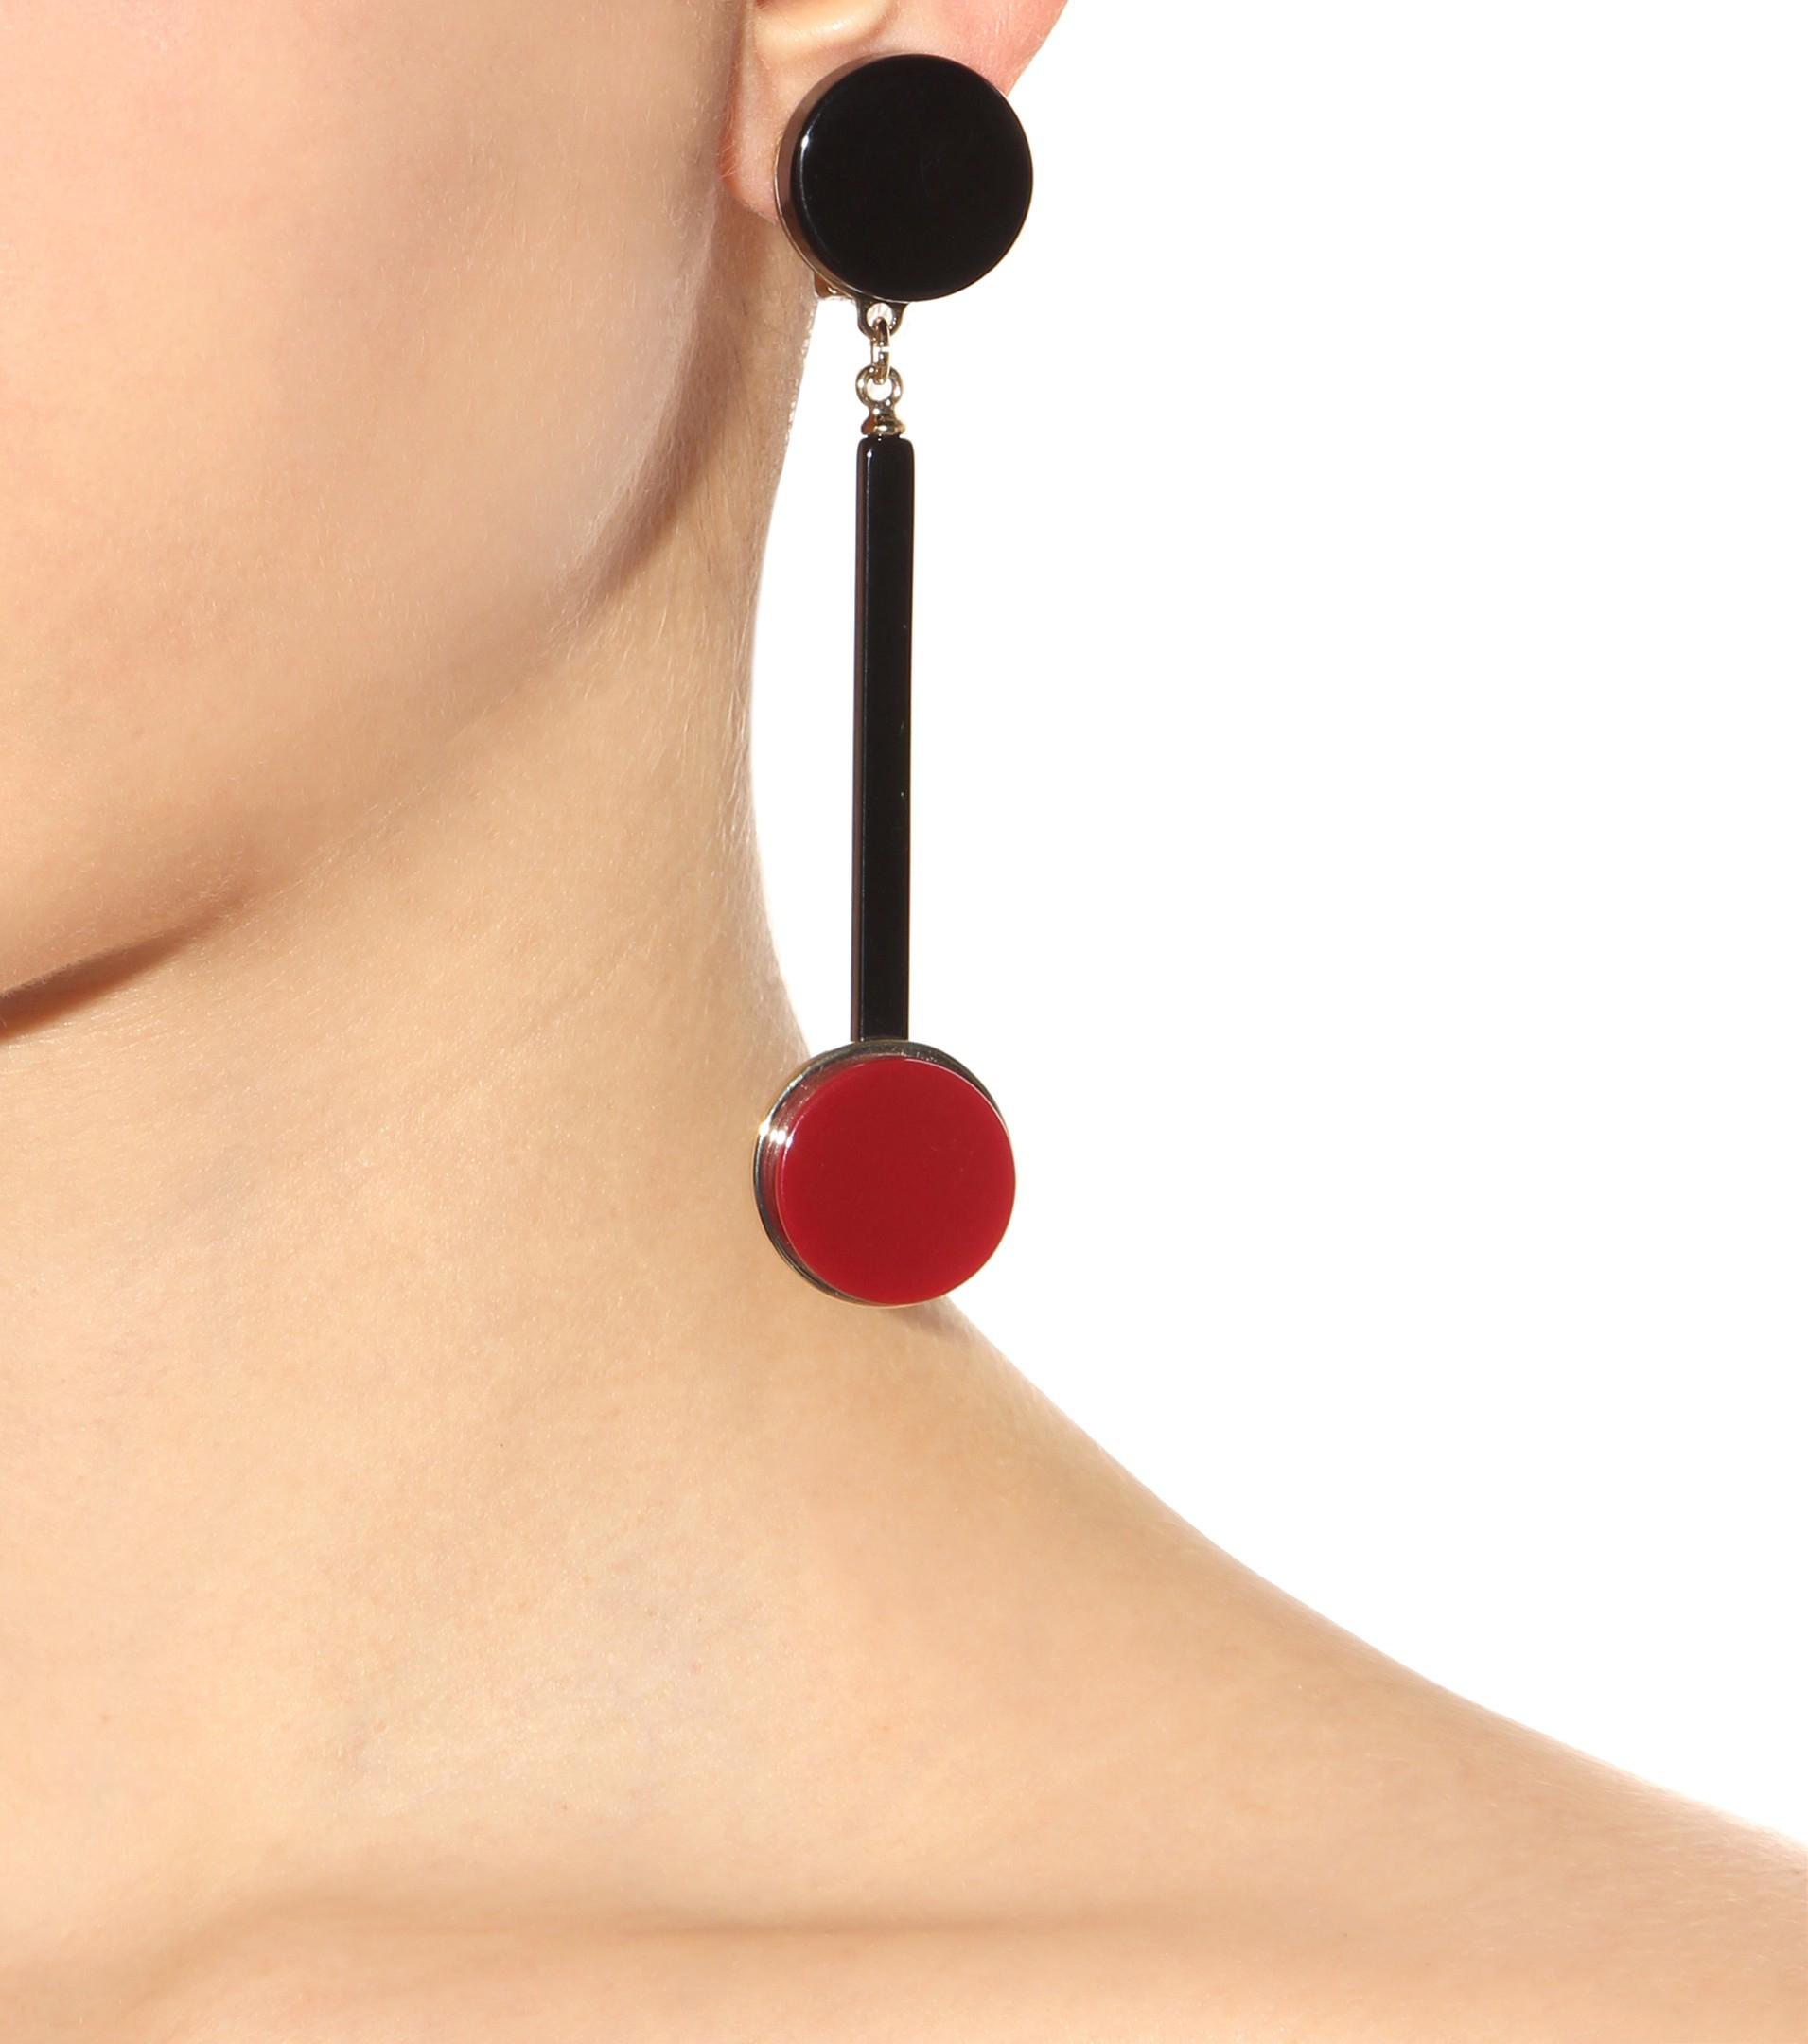 Marni Clip-on earrings QIWUY1vsu4